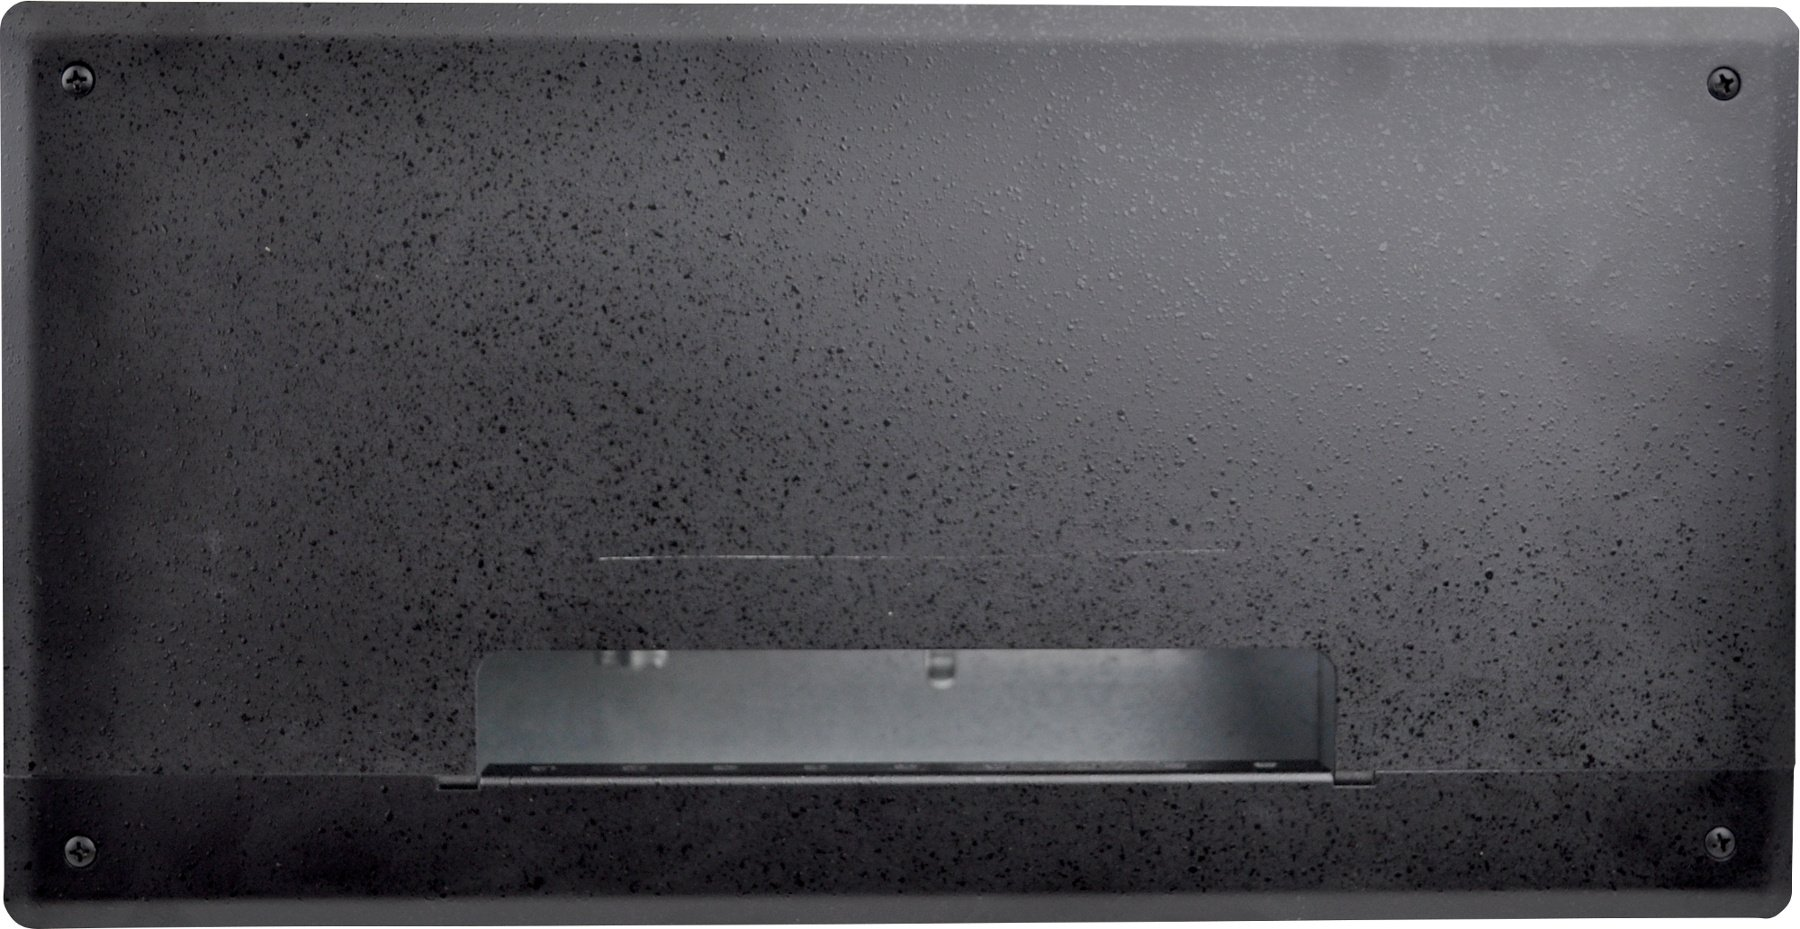 Plasma/Flat Panel Display Wall Box with 6 IPS, 3 AC/Gang, 2 Knockouts